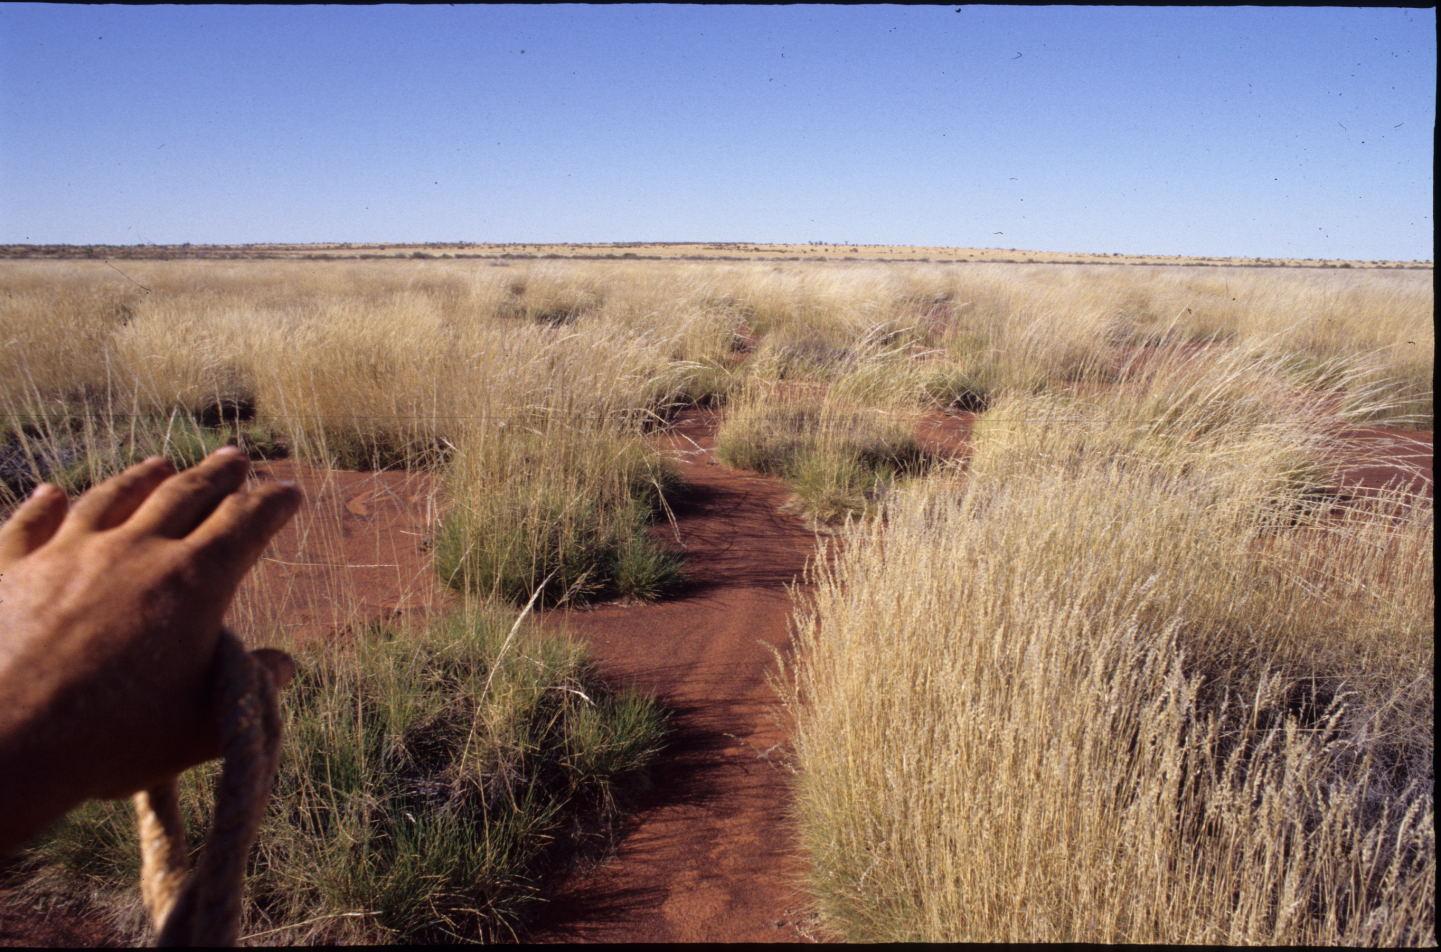 The way ahead, Gibson Desert, WA.